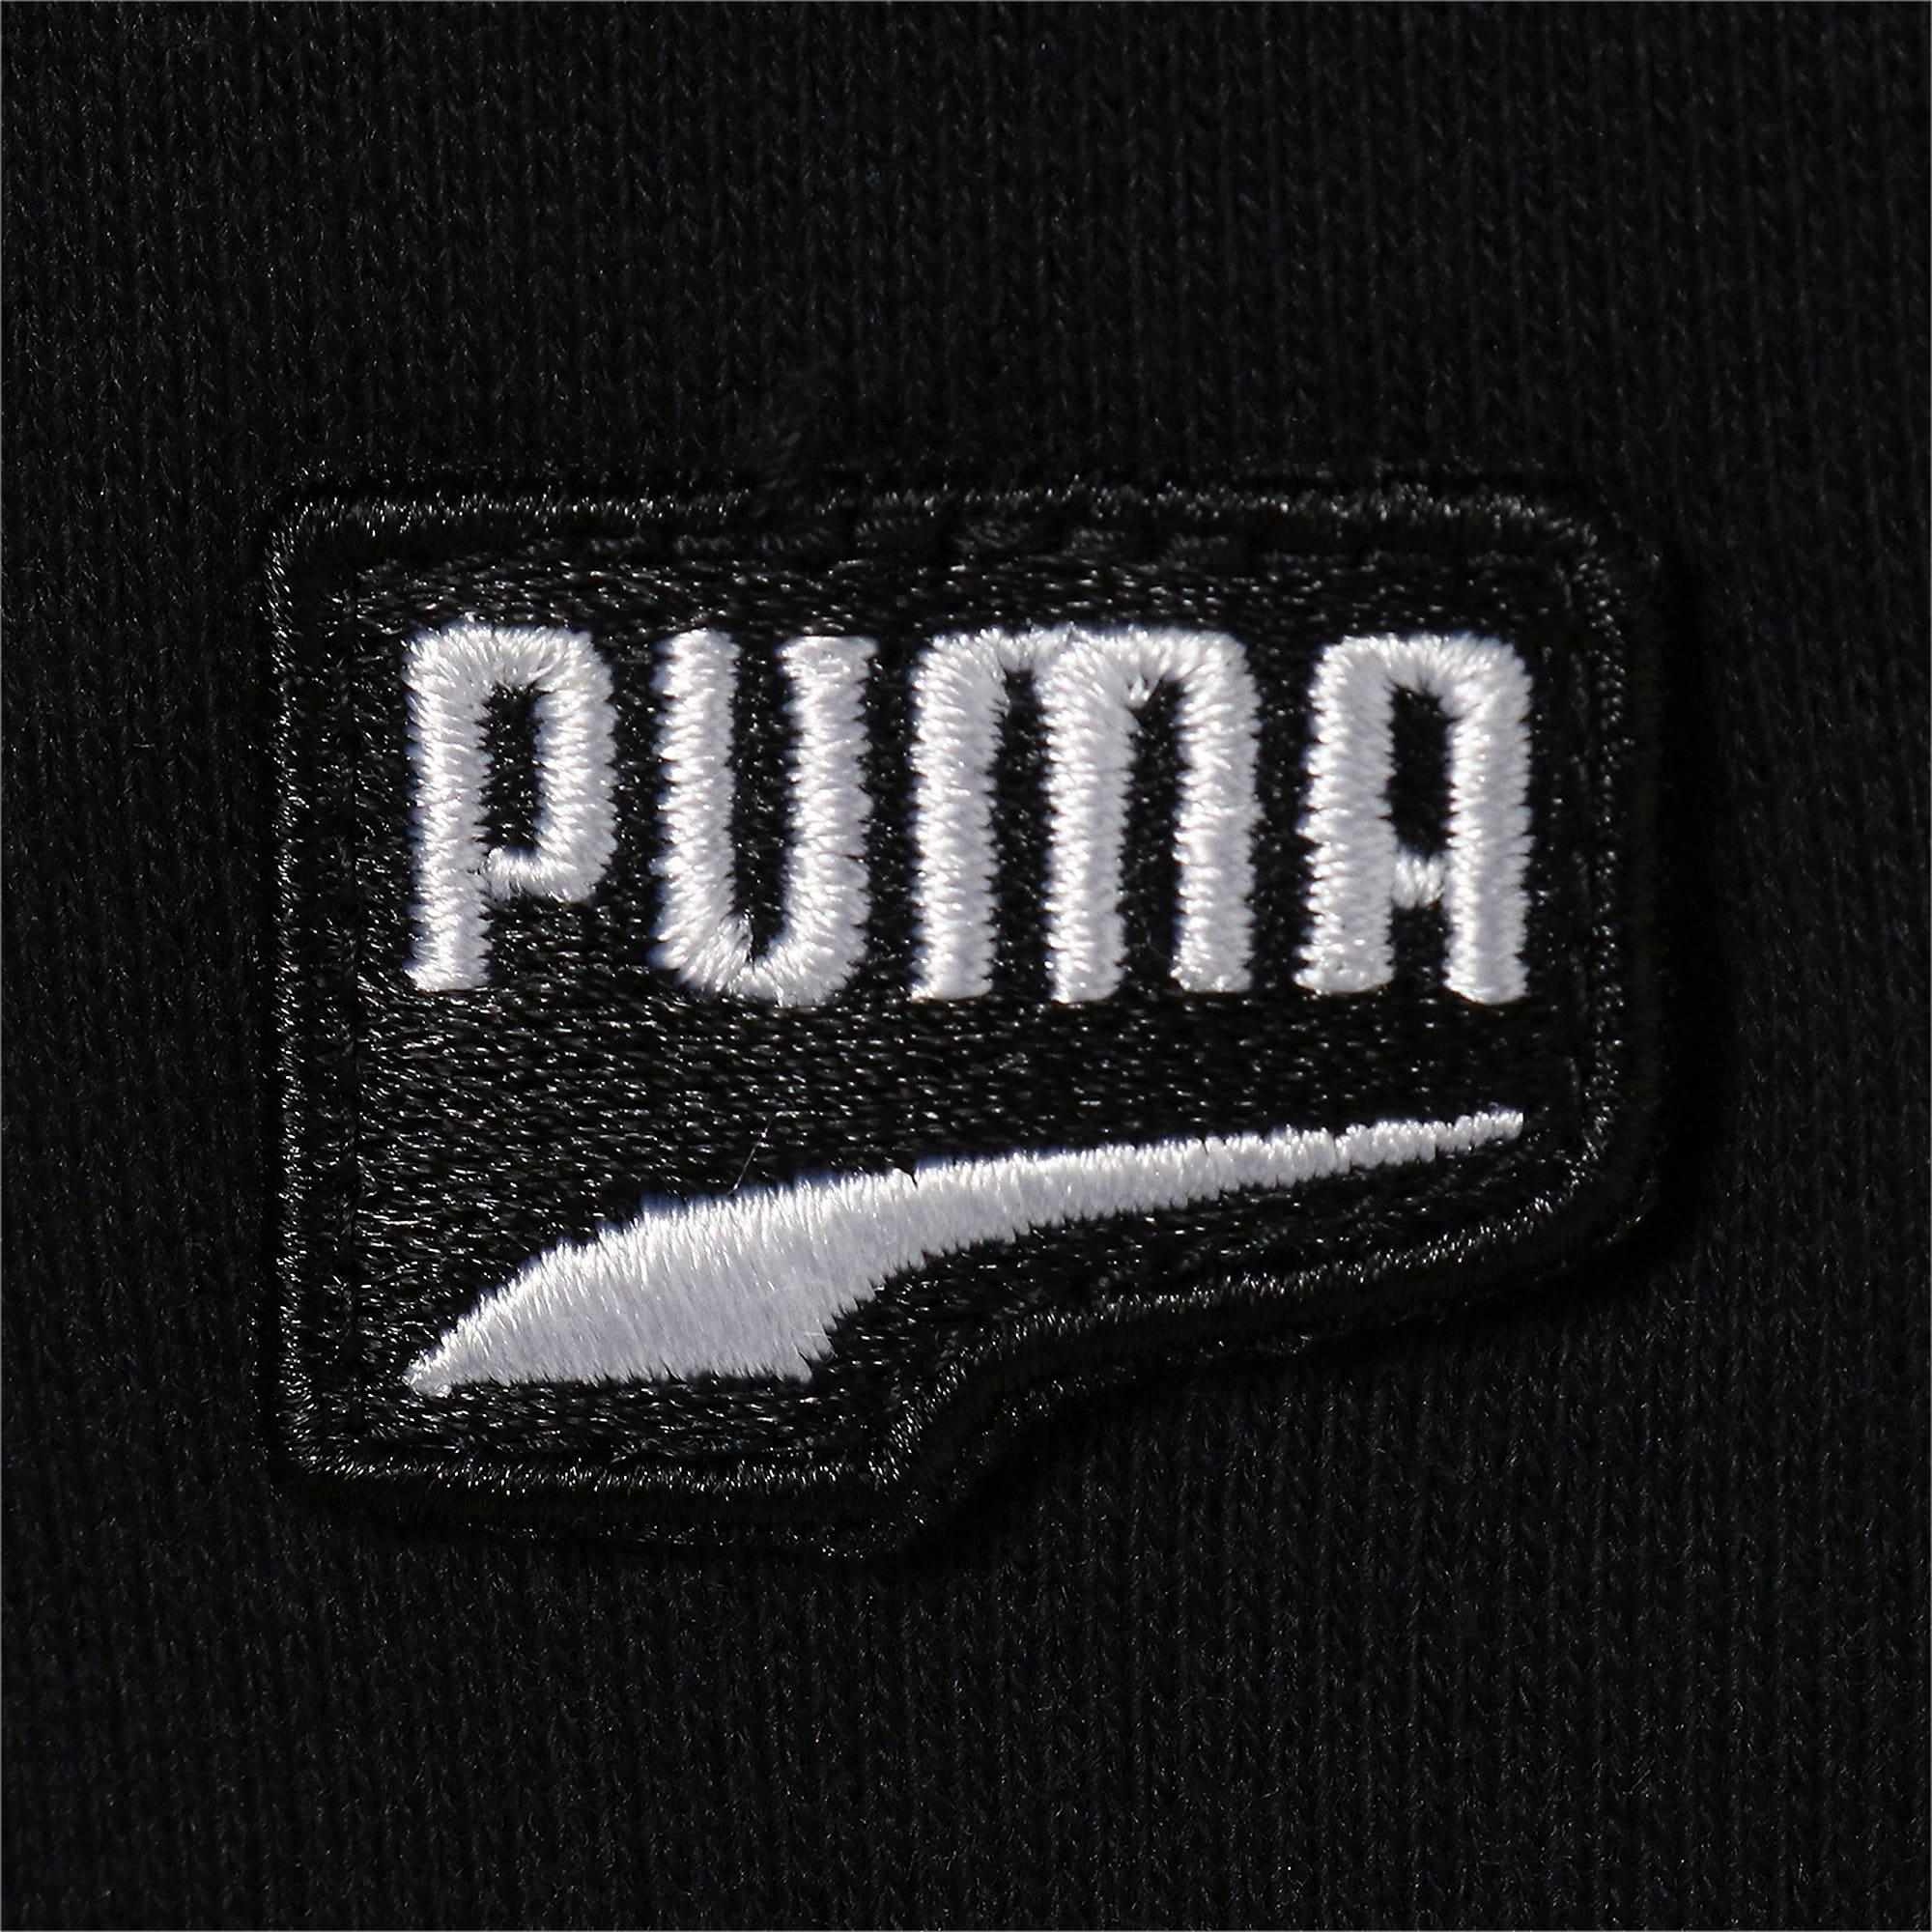 Thumbnail 7 of ダウンタウン スウェットパンツ, Puma Black, medium-JPN